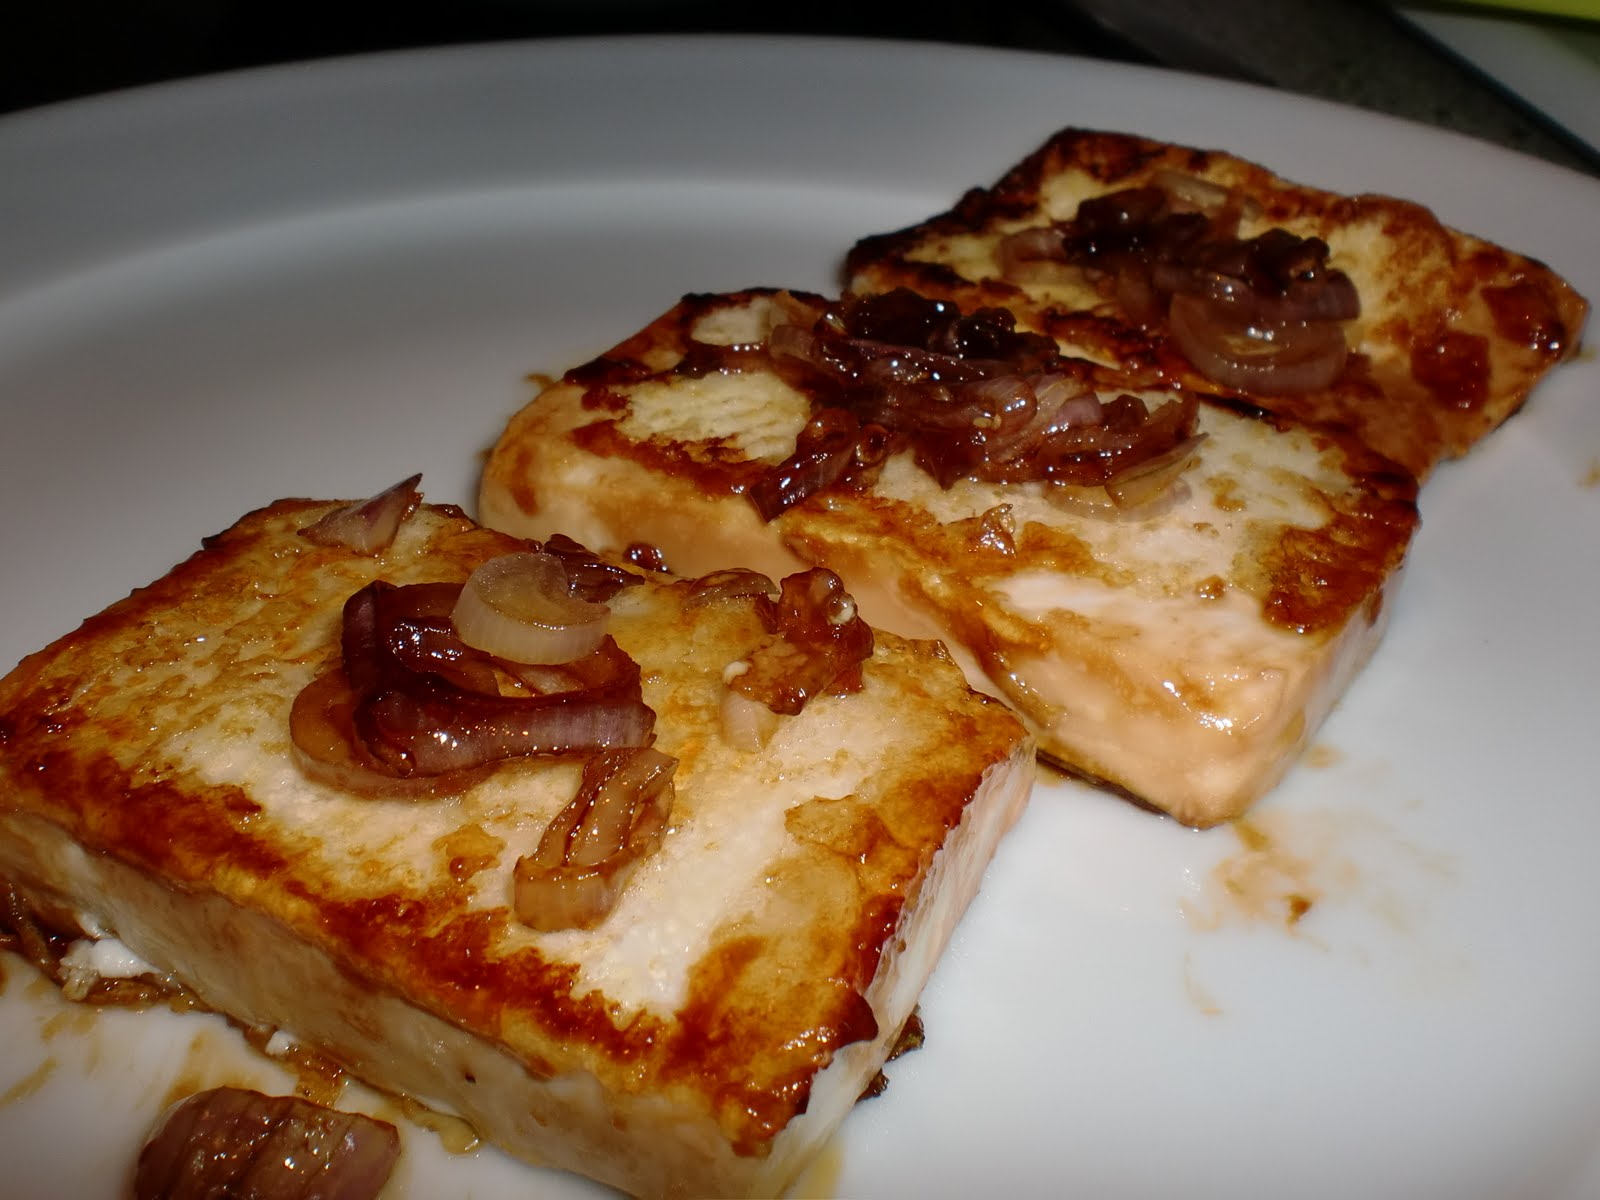 buchweizen tofu hauptgericht